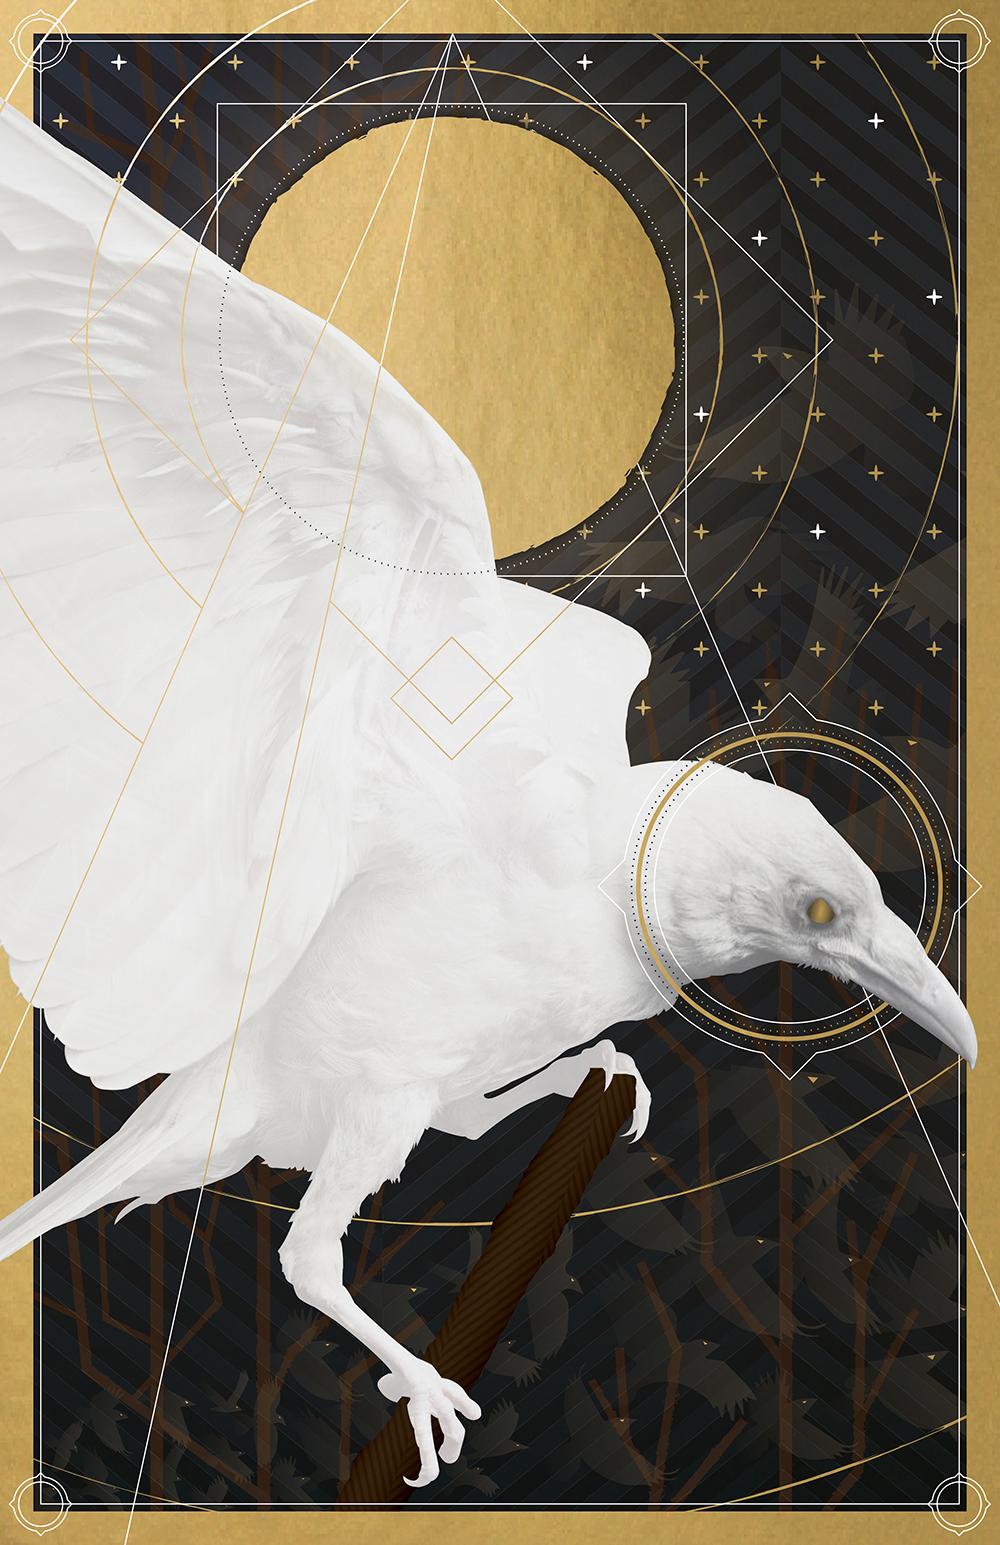 """Leucistic Corvus Corax"" by Thomas Wiener"